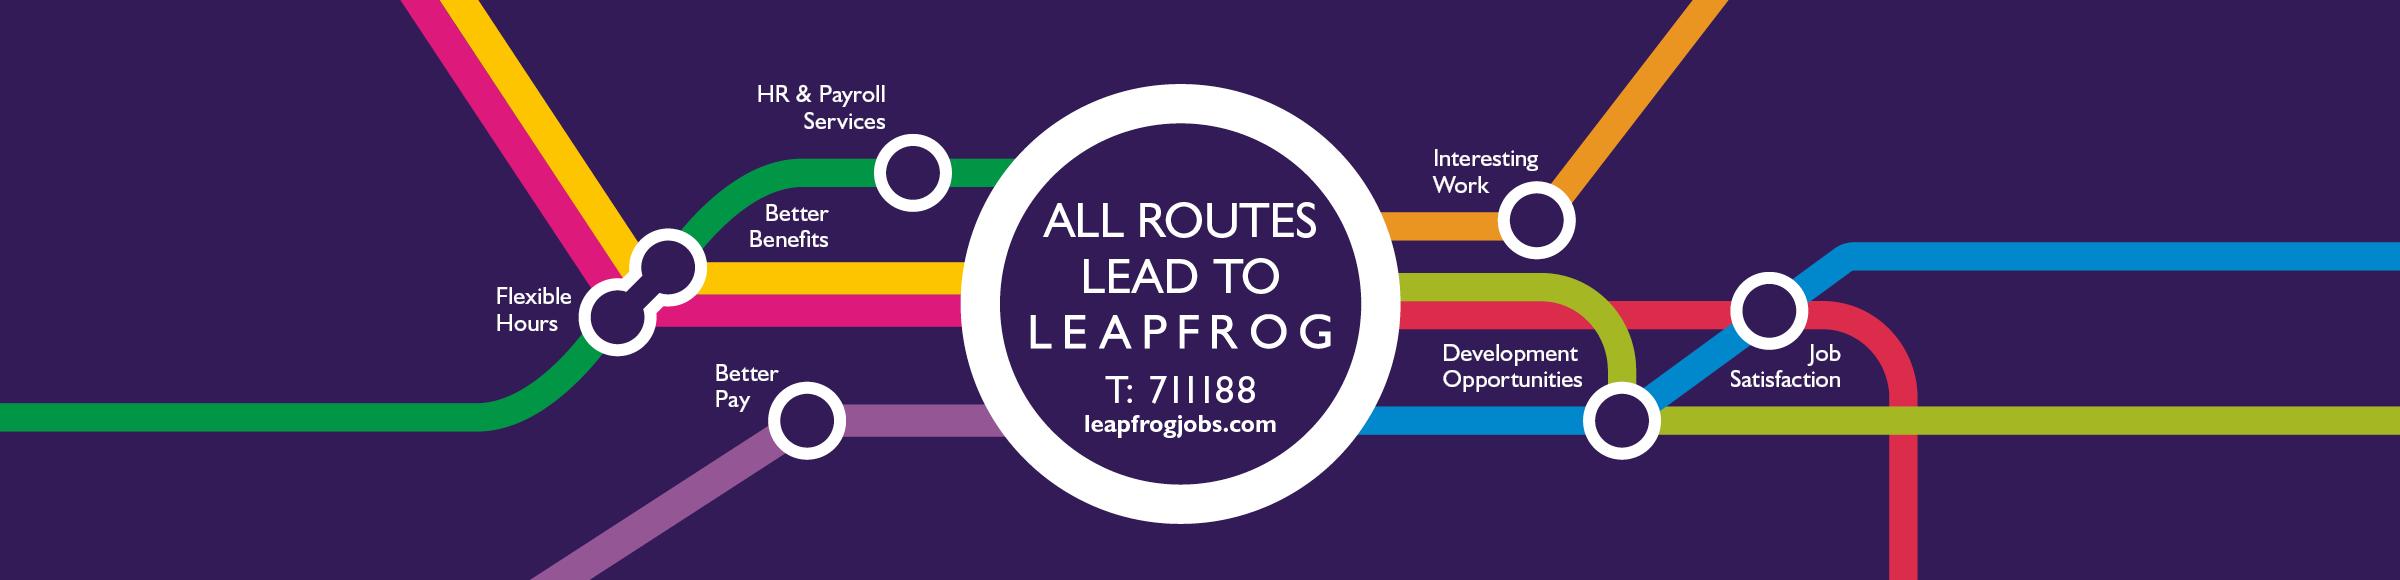 Guernsey Jobs - Leapfrog Recruitment